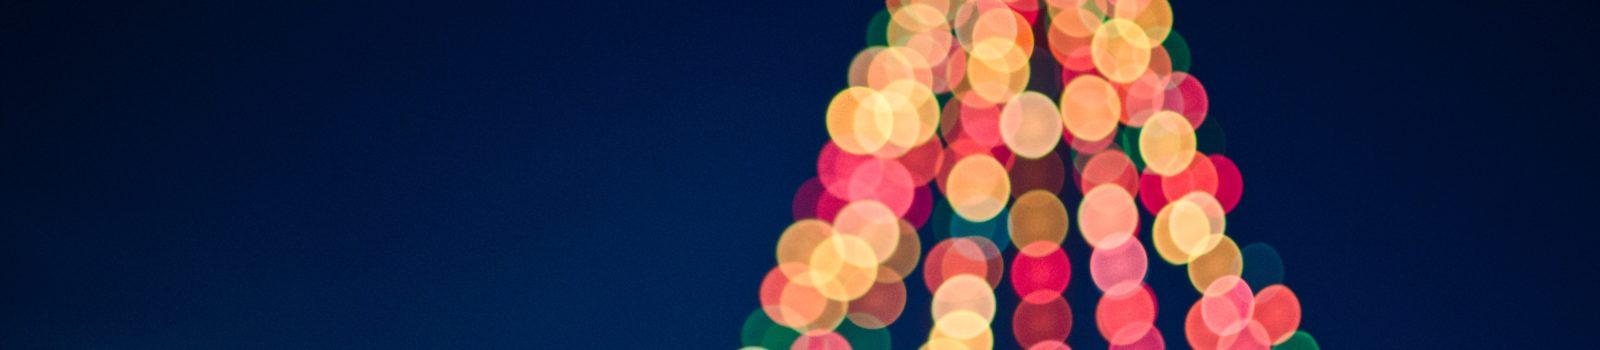 health-hacks-holiday-season